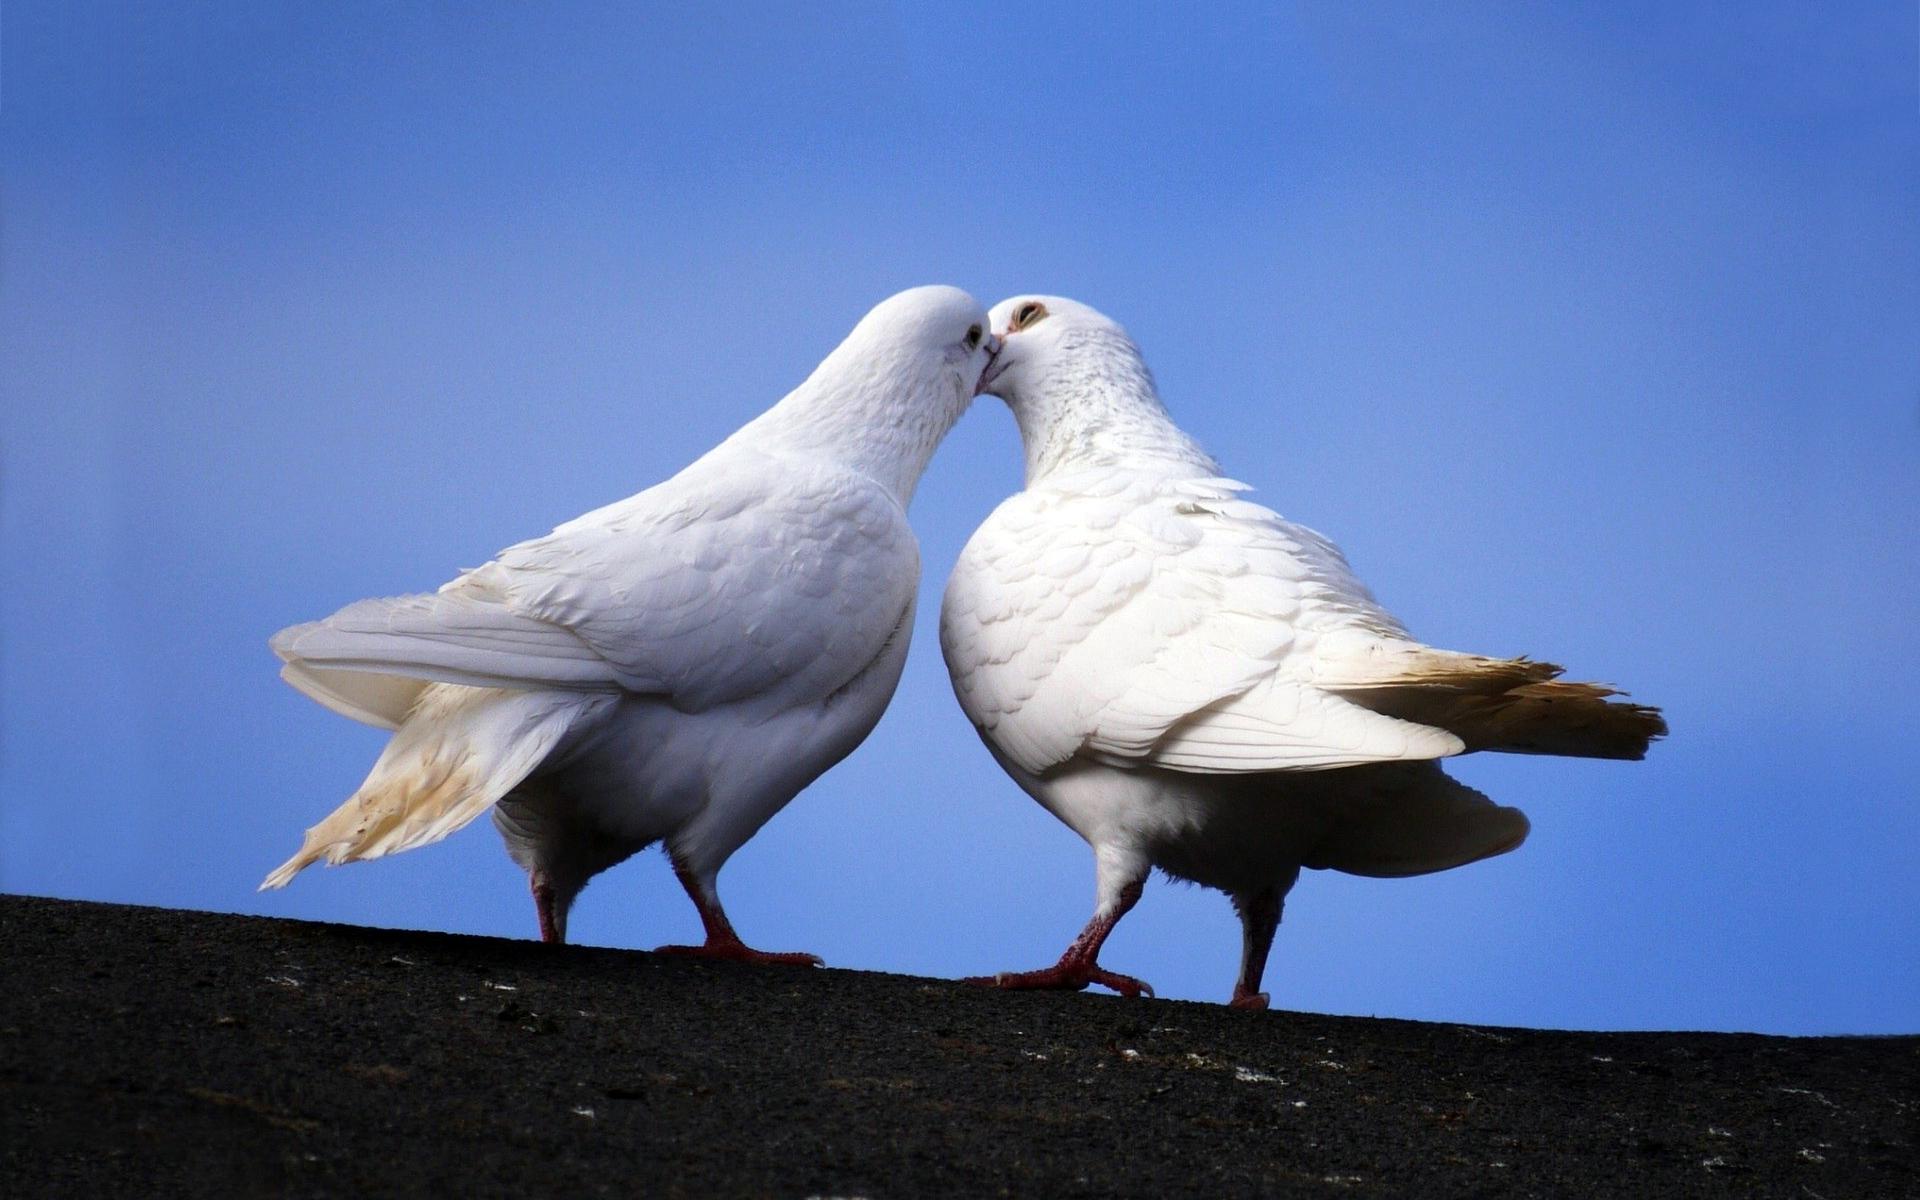 white dove images